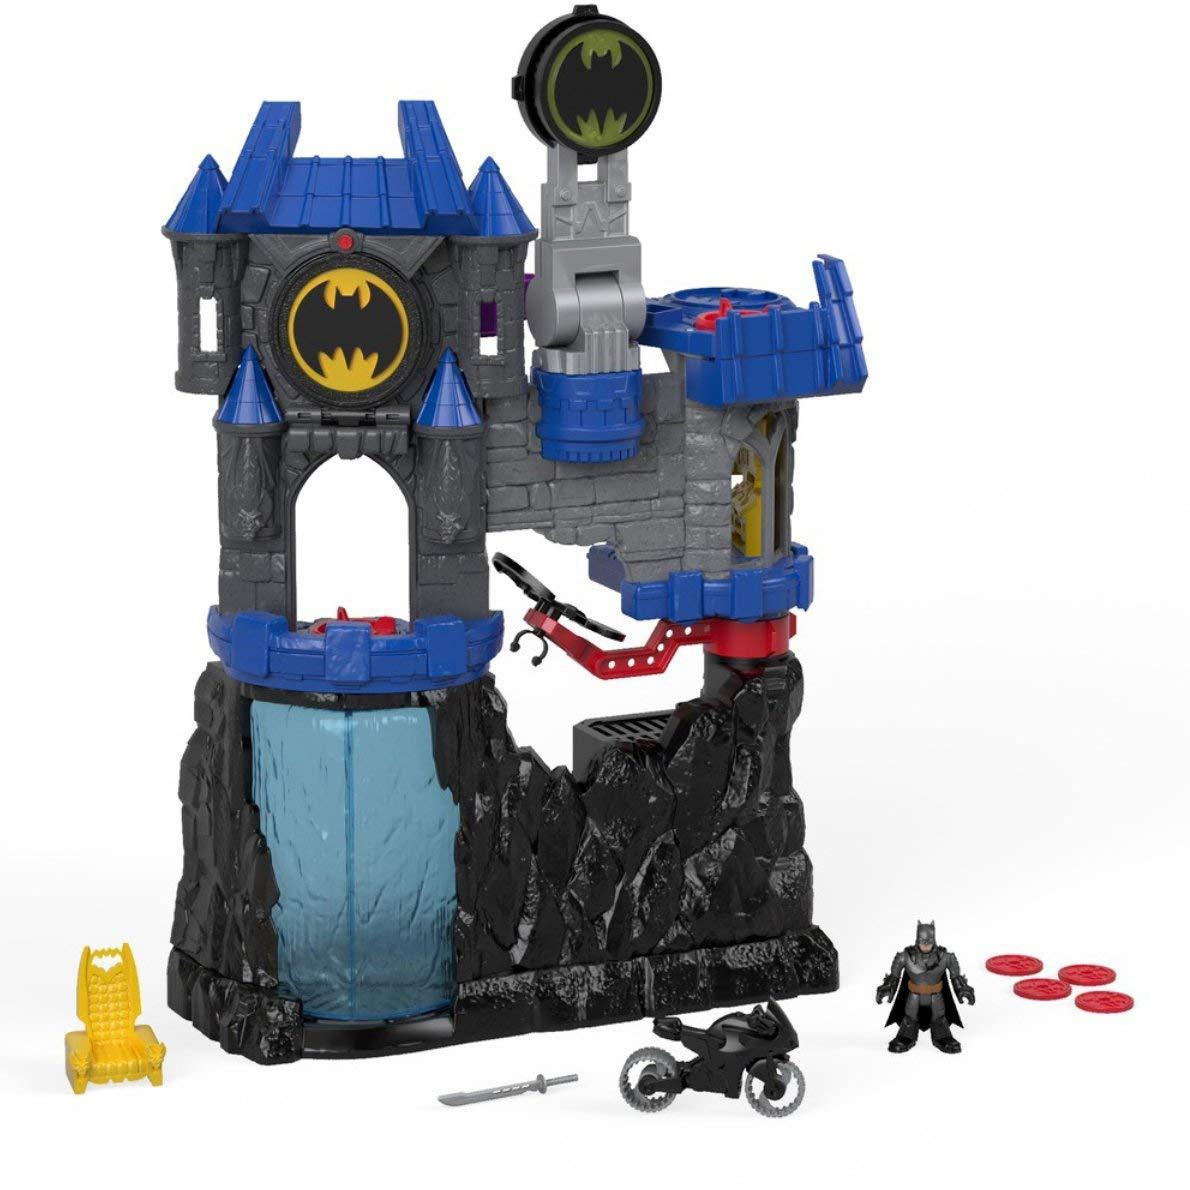 Fisher-Price Imaginext DC Super Friends, Wayne Manor Batcave